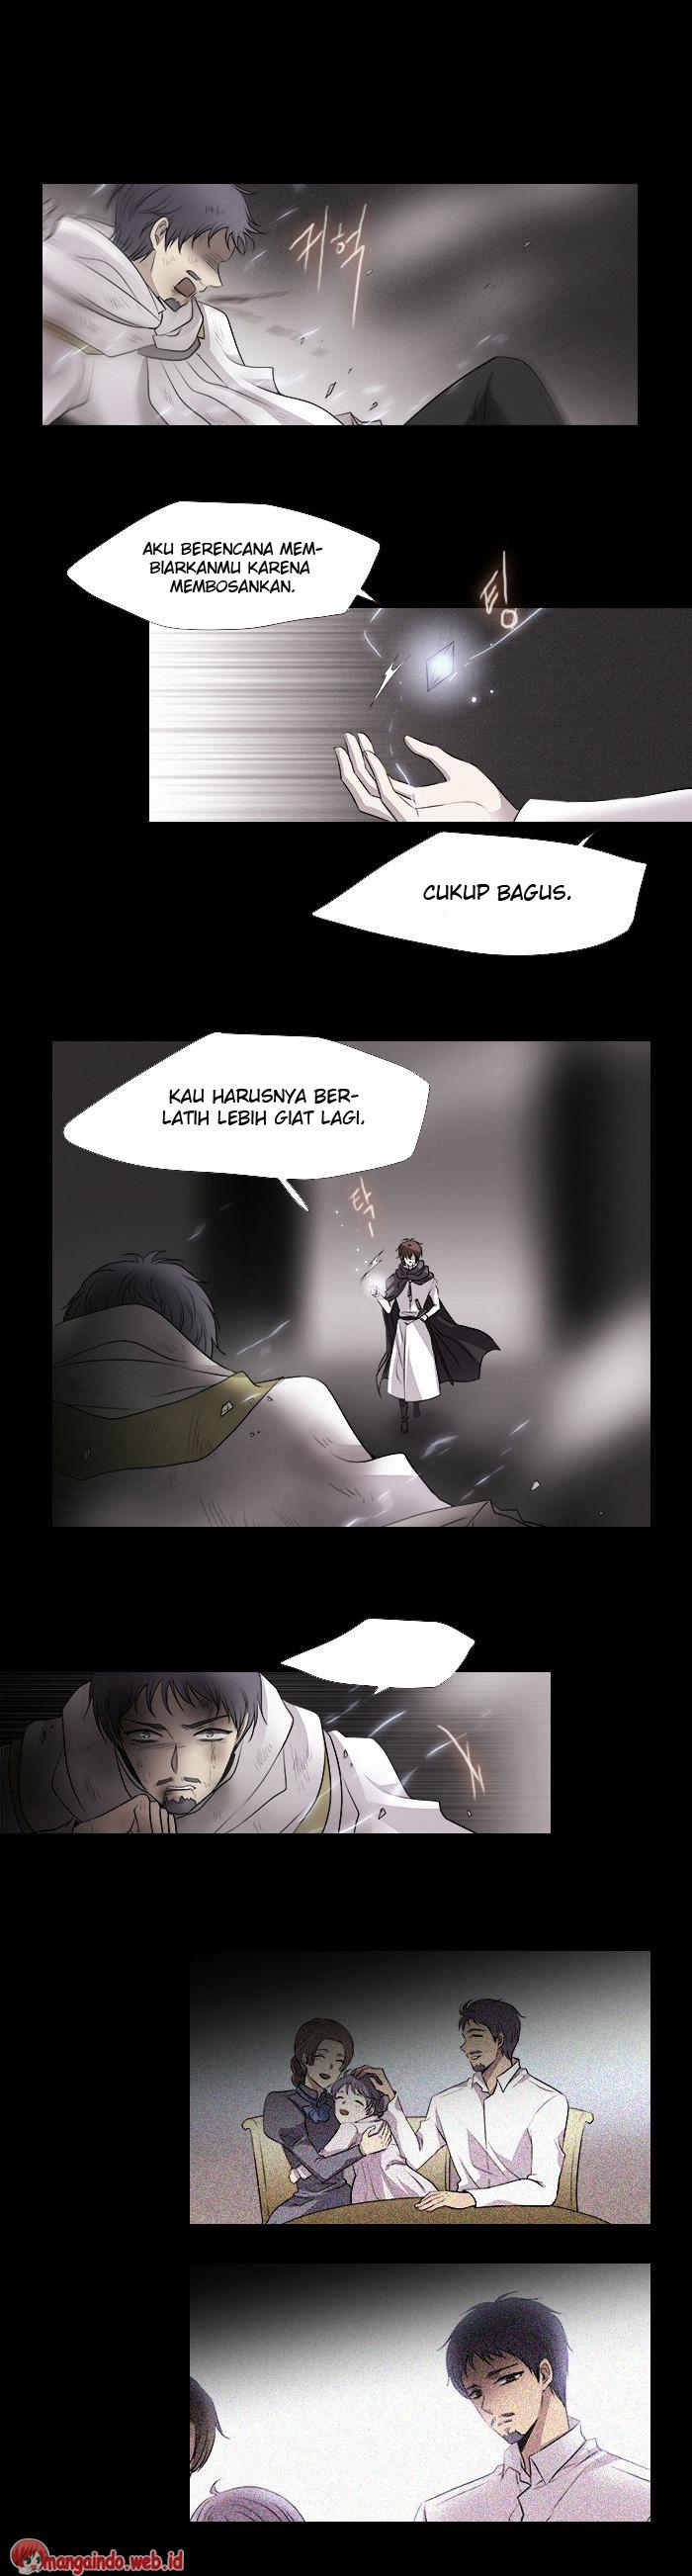 Komik black haze 212 - chapter 212 213 Indonesia black haze 212 - chapter 212 Terbaru 13|Baca Manga Komik Indonesia